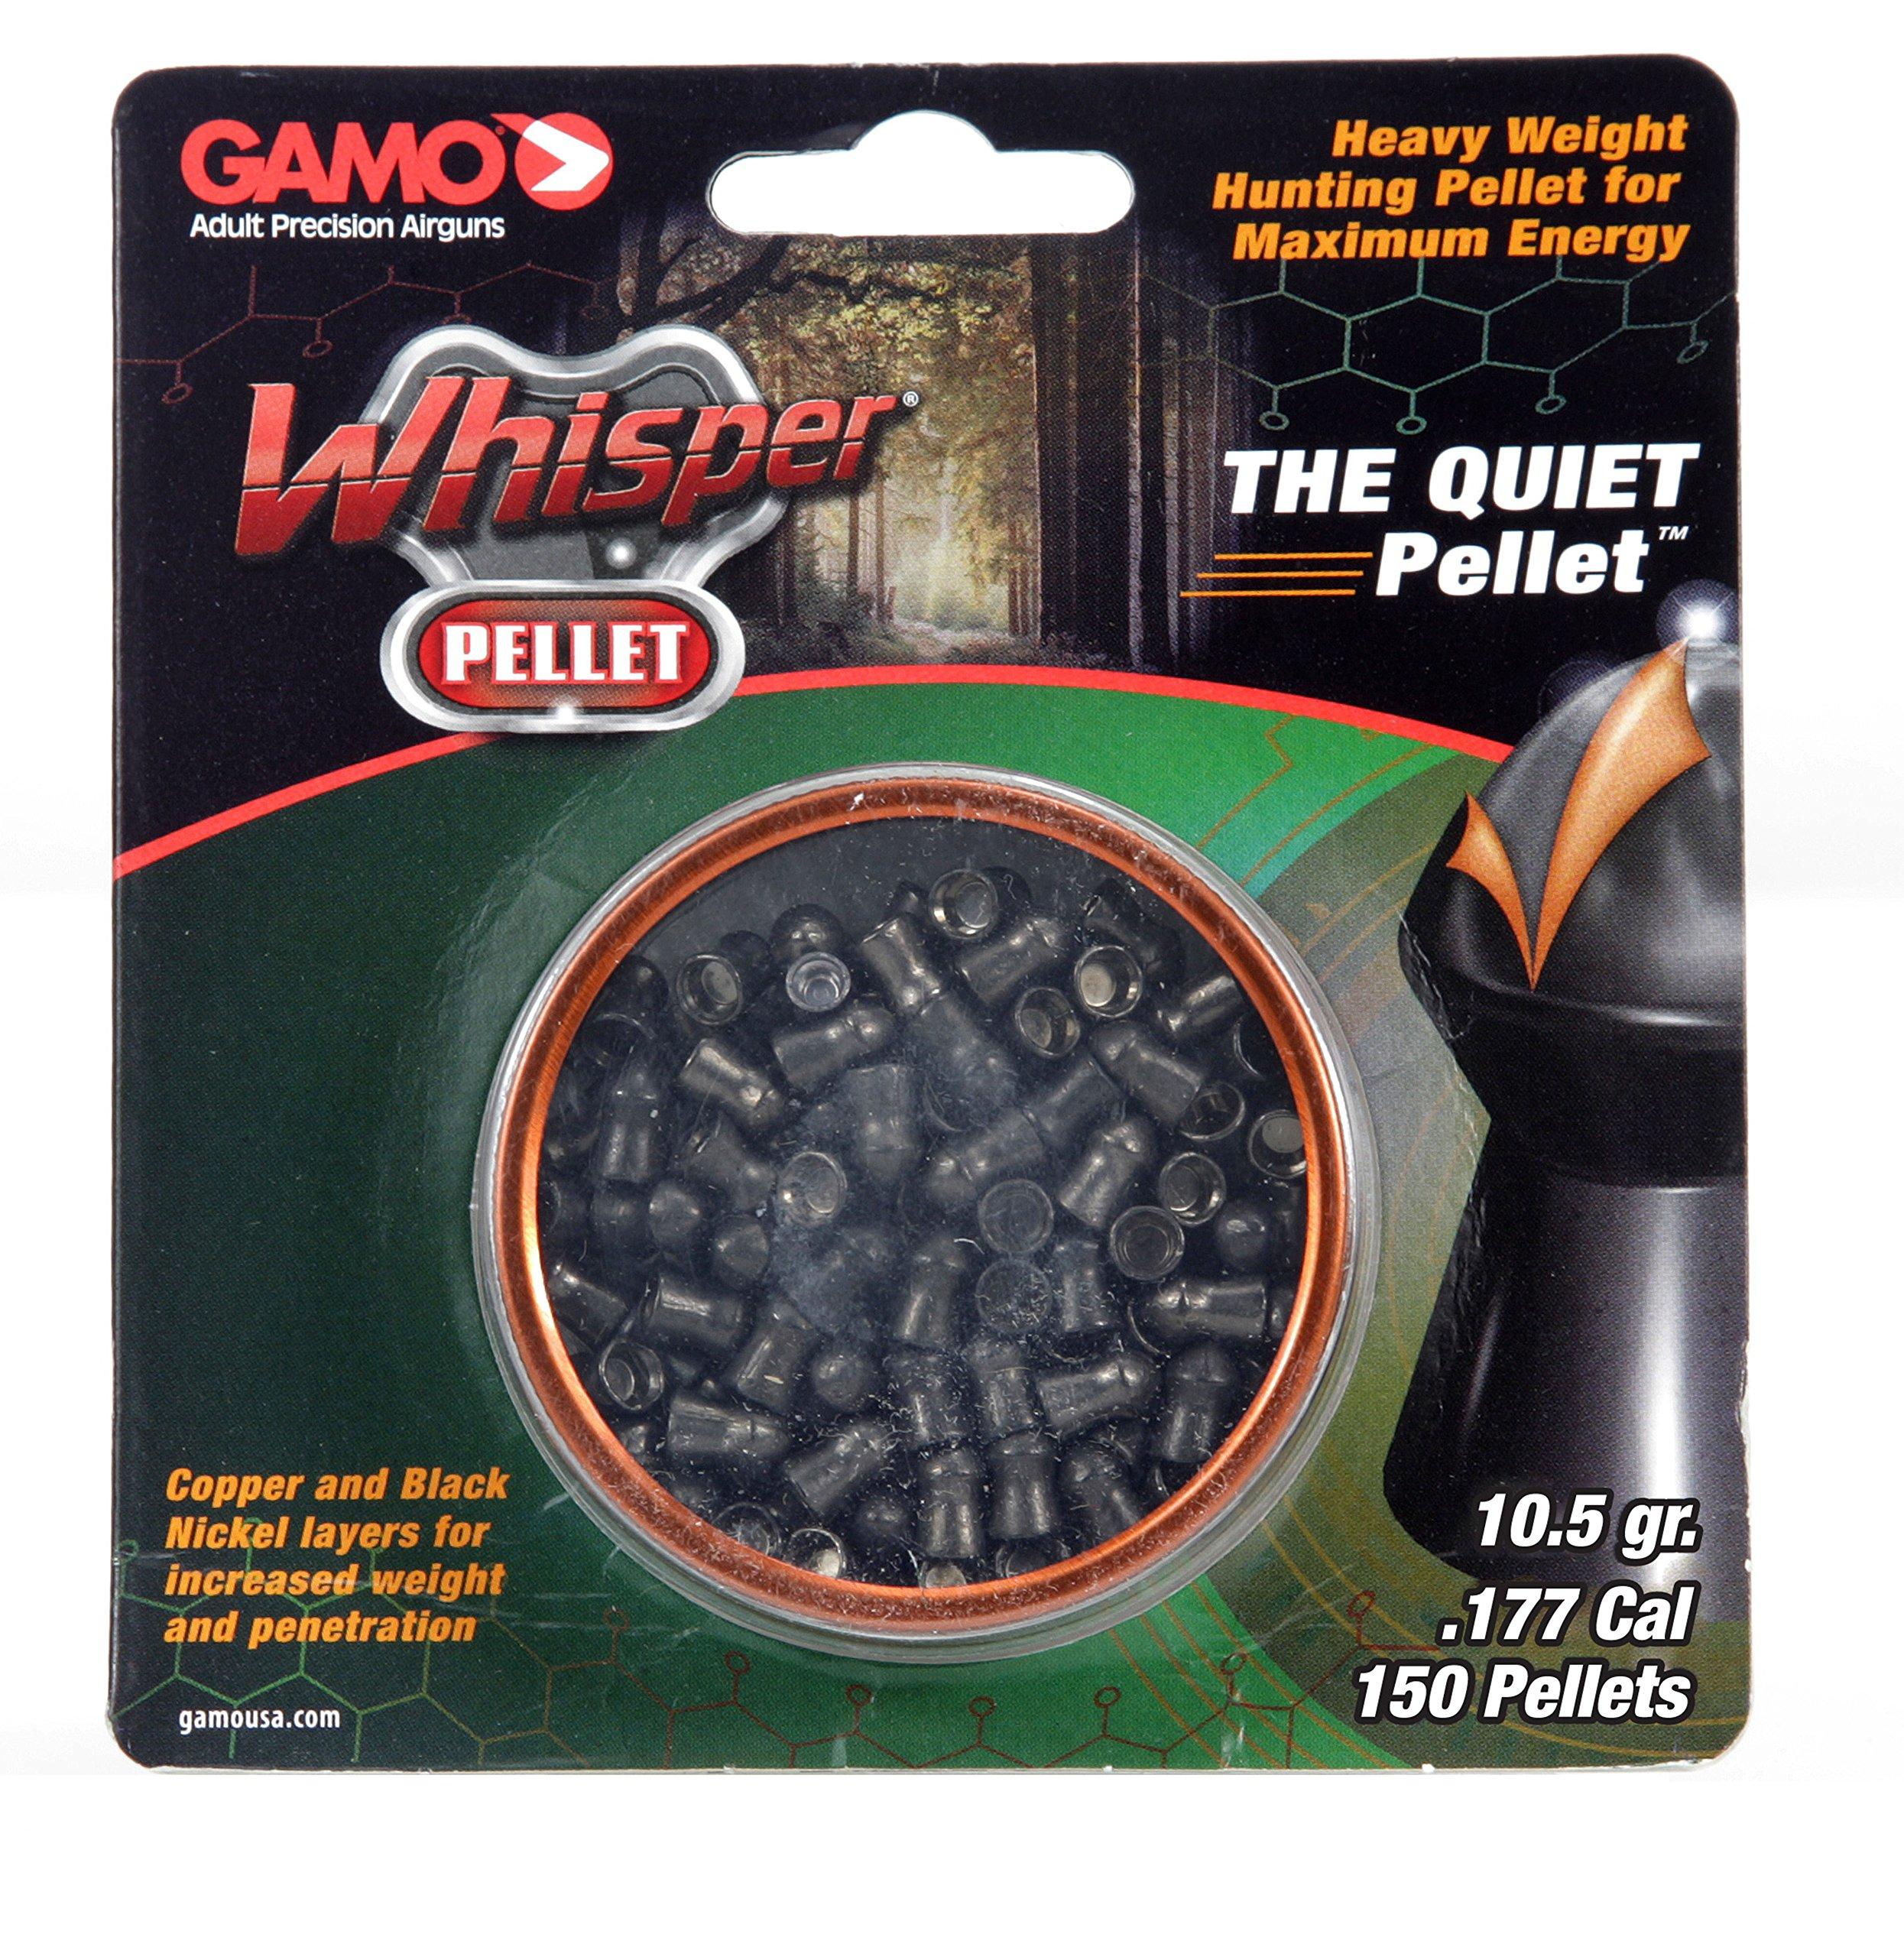 Gamo 632272254 Whisper Pellet .177 Caliber, 150 Count by Gamo